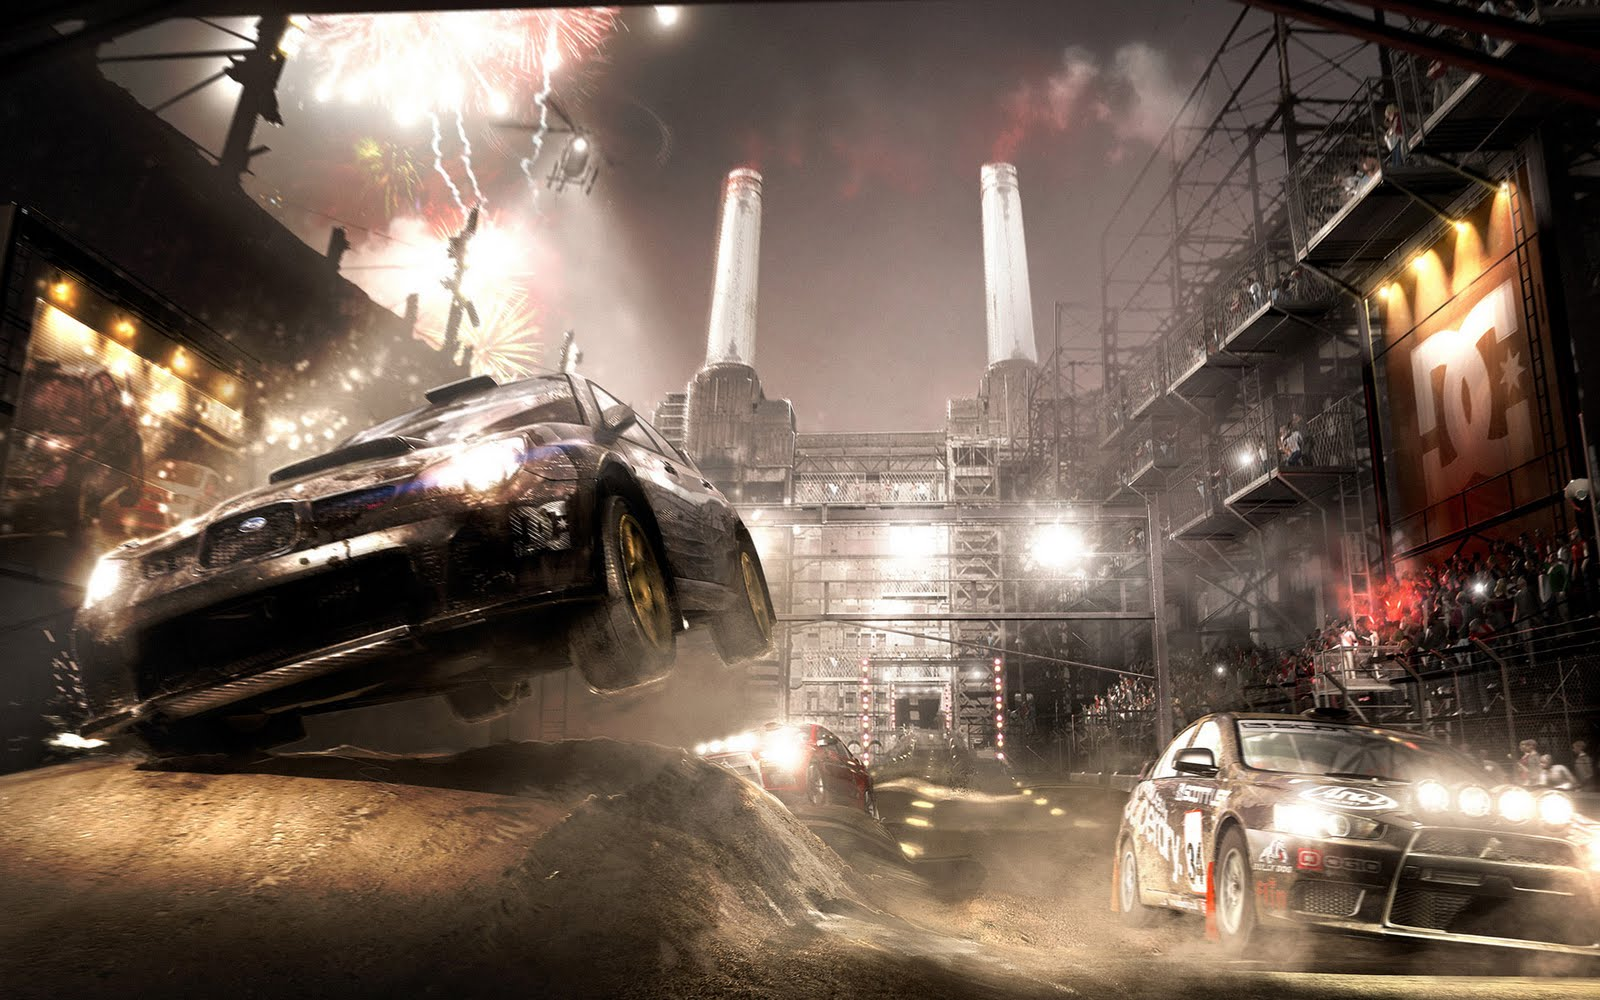 http://2.bp.blogspot.com/_2IU2Nt4rD1k/S64kx4LCd-I/AAAAAAAABNw/5pQ4RYq-FAI/s1600/car_game_wallpaper.jpg